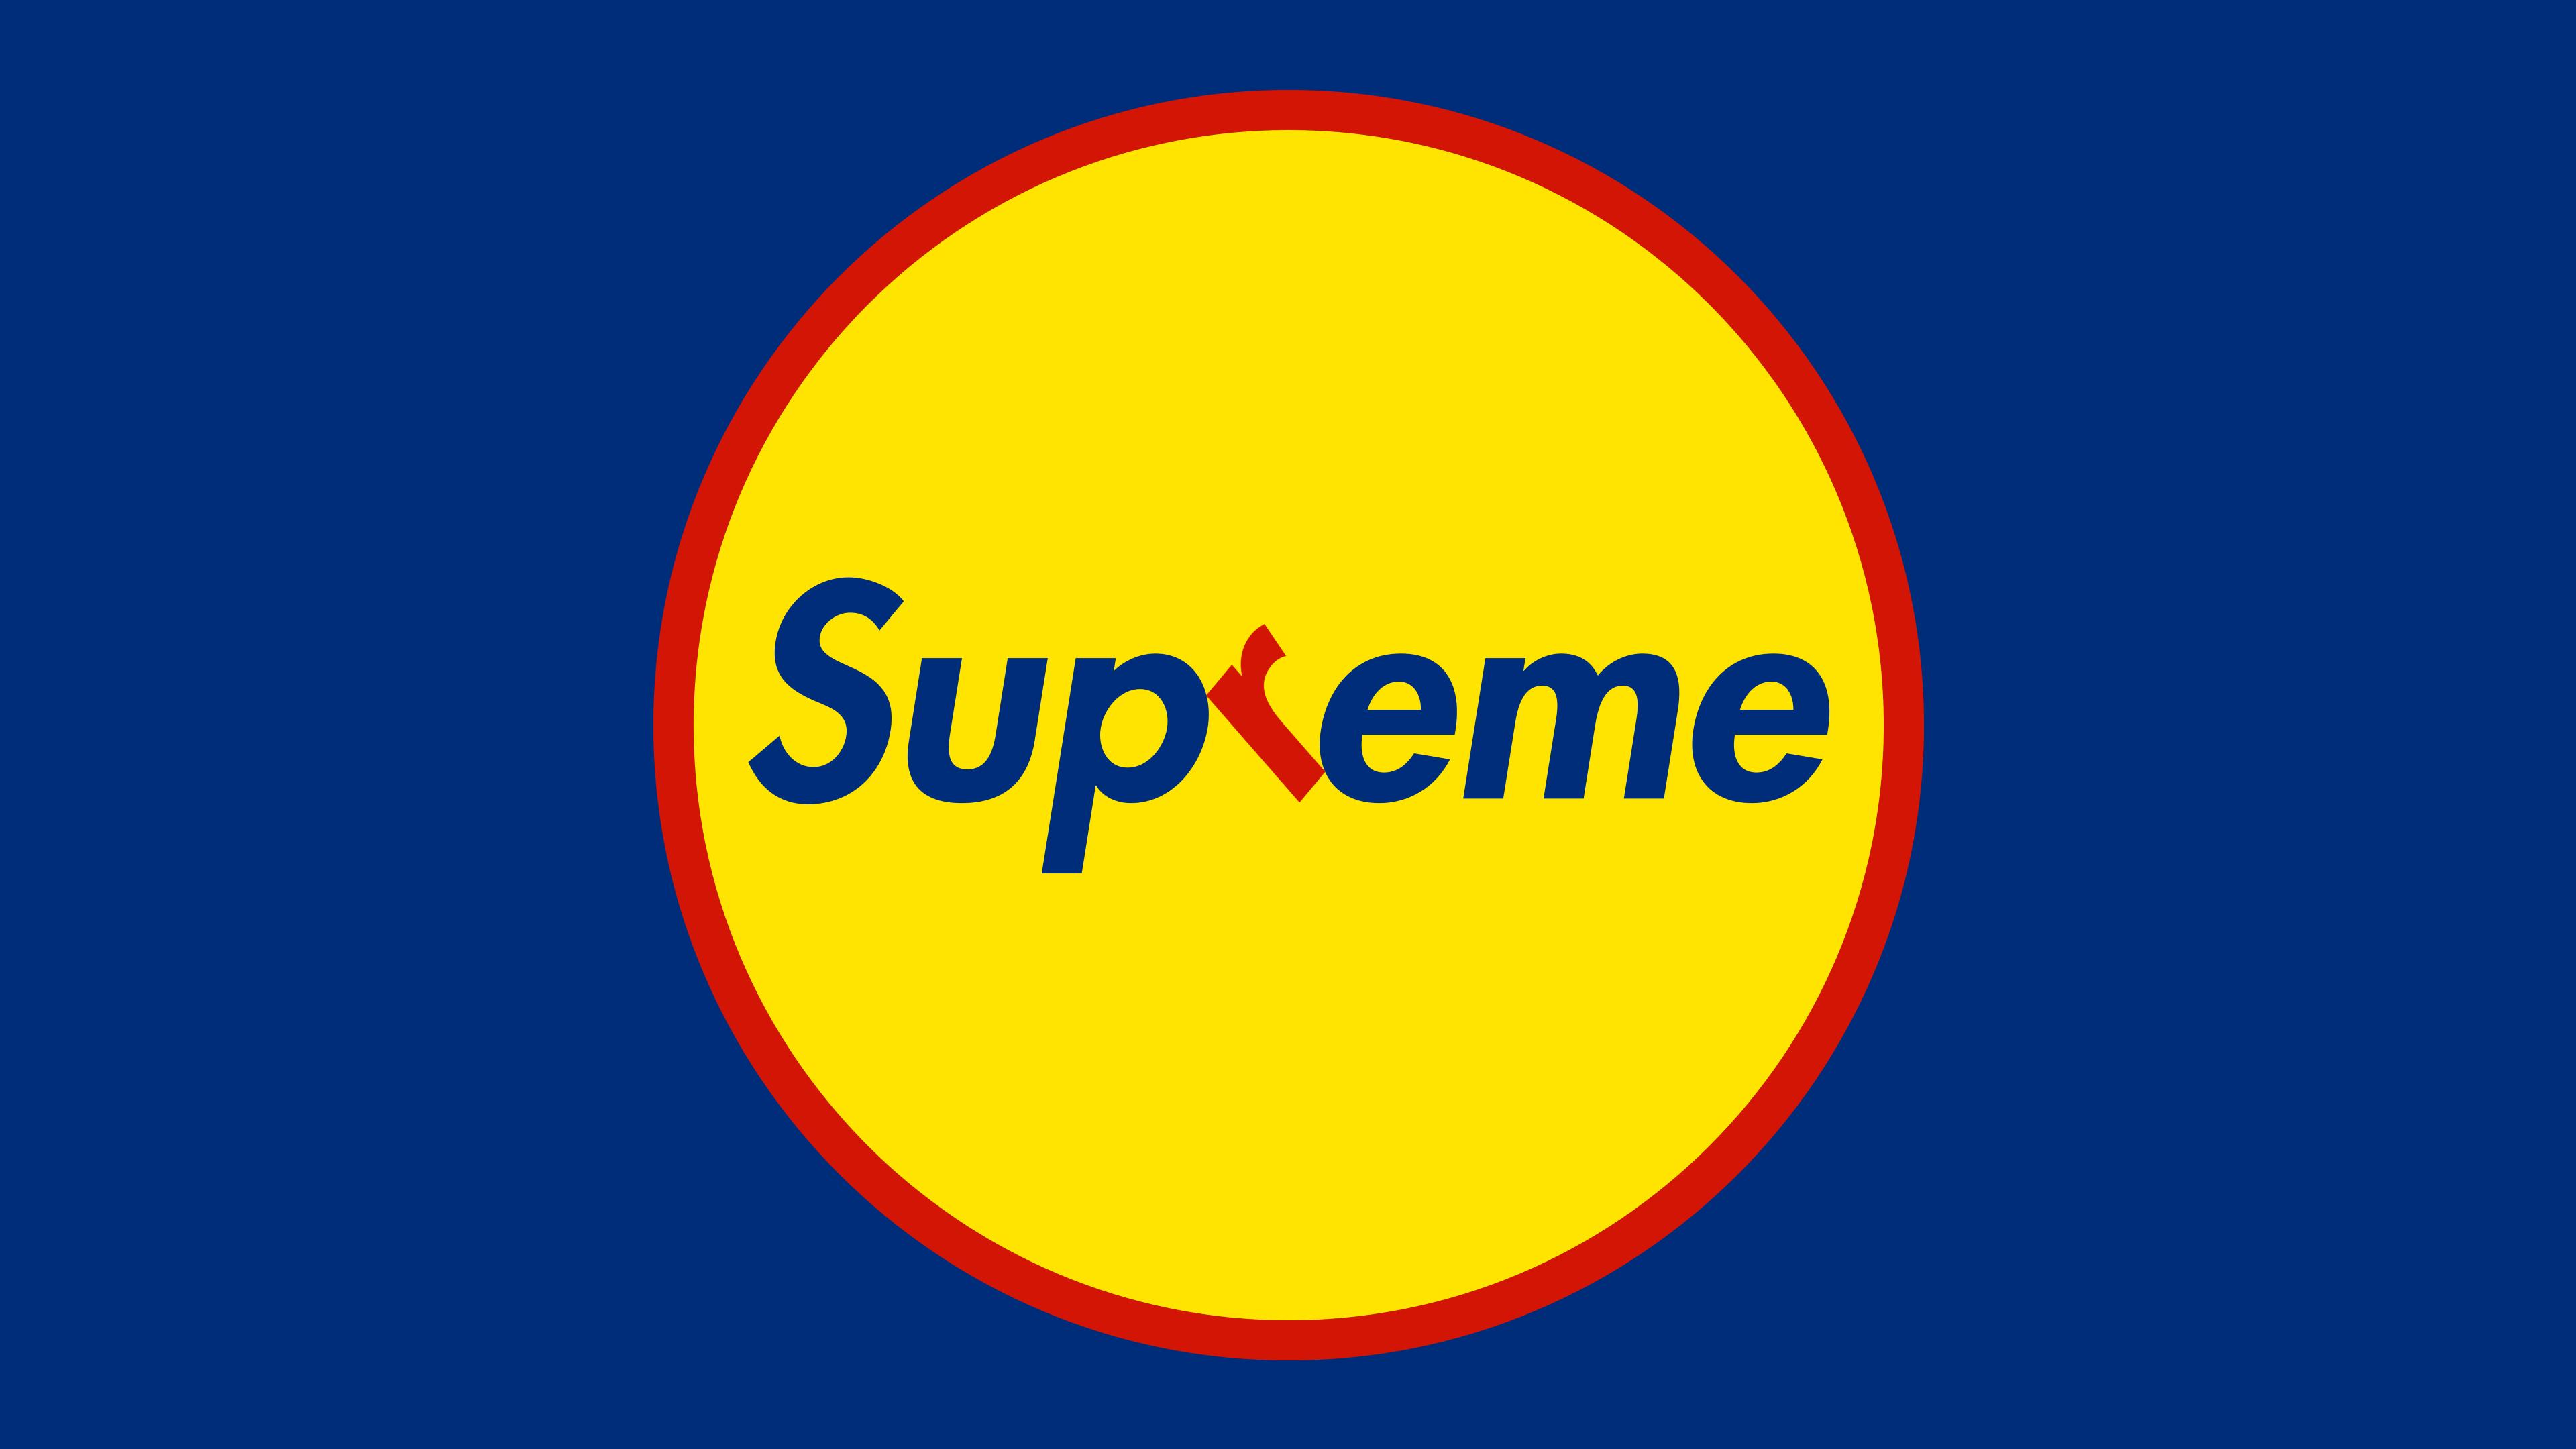 Wallpaper Supreme Logo Humor 3840x2160 Mulligamulle